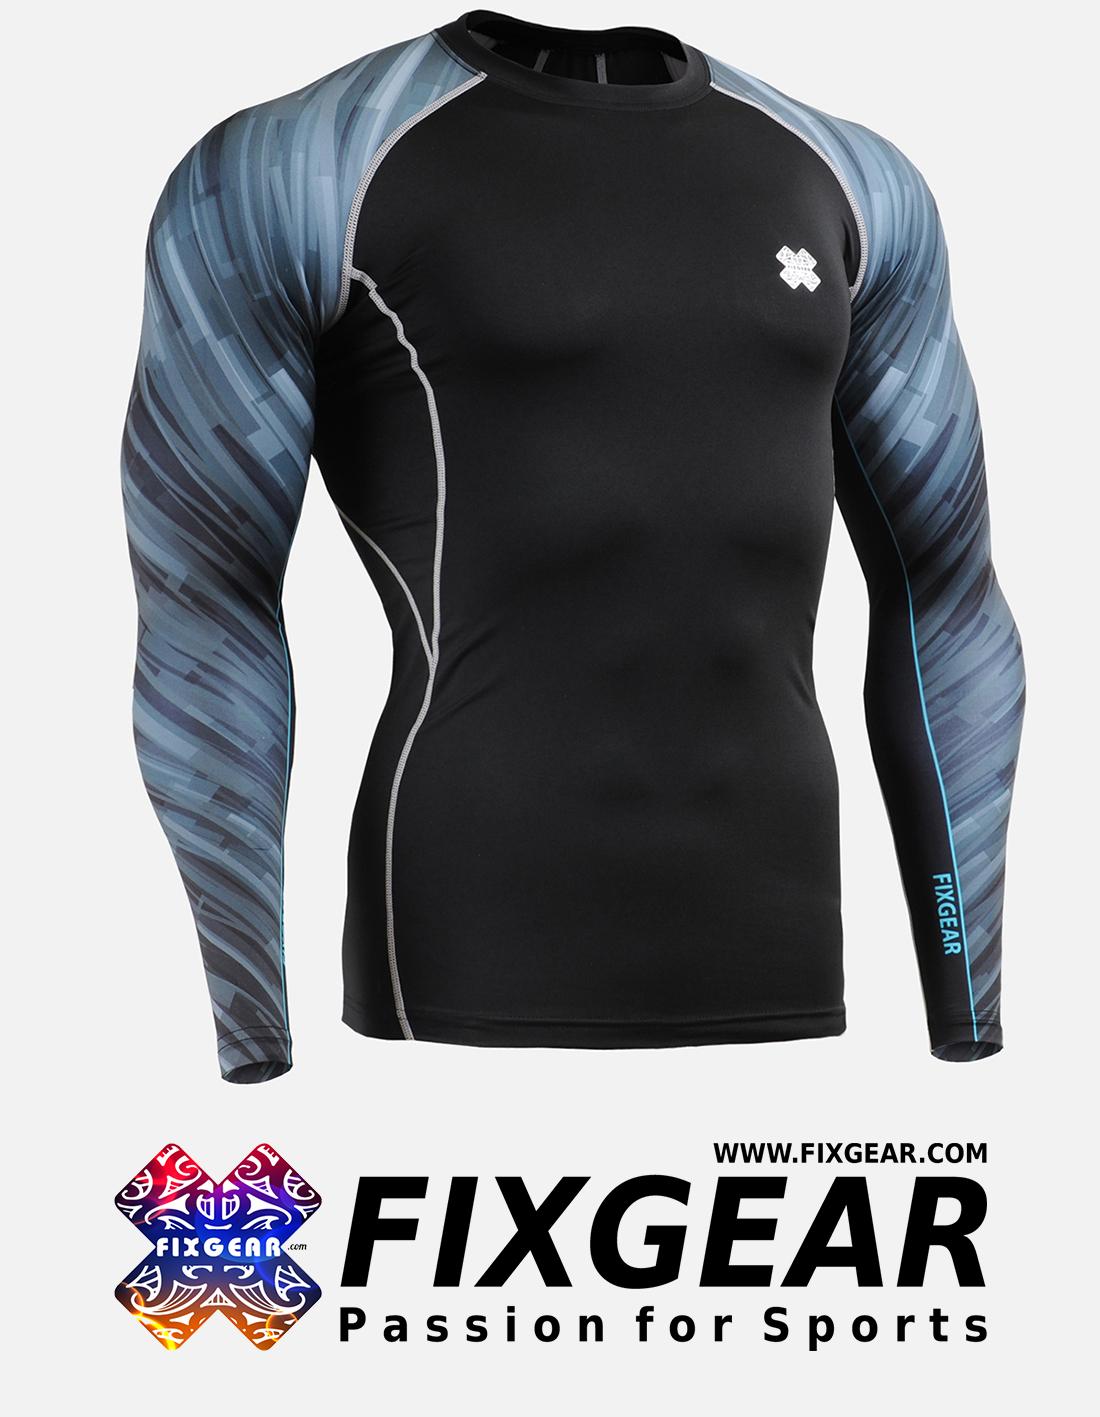 FIXGEAR CPD-B67 Compression Base Layer Shirt